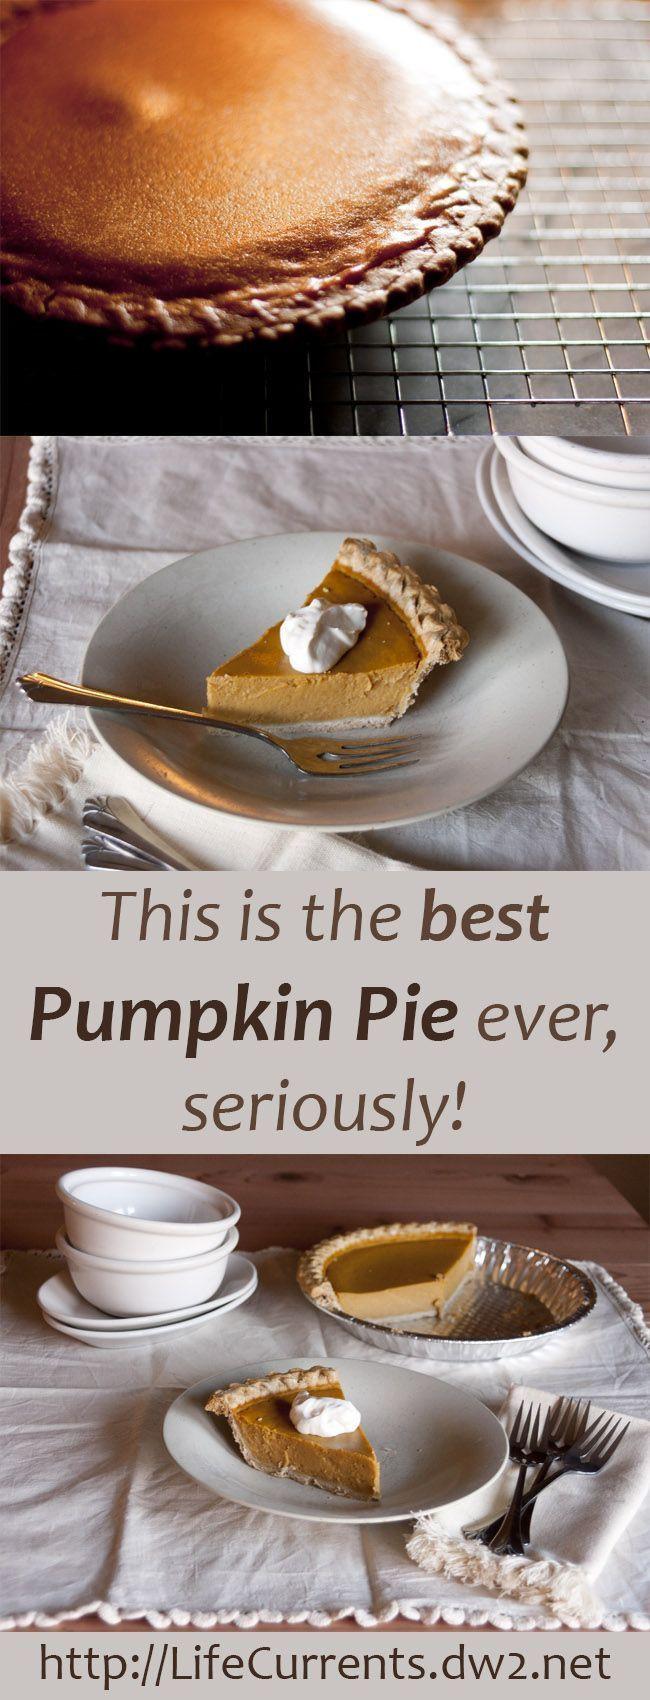 Pumpkin Pie Thanksgiving  17 Best images about pies on Pinterest